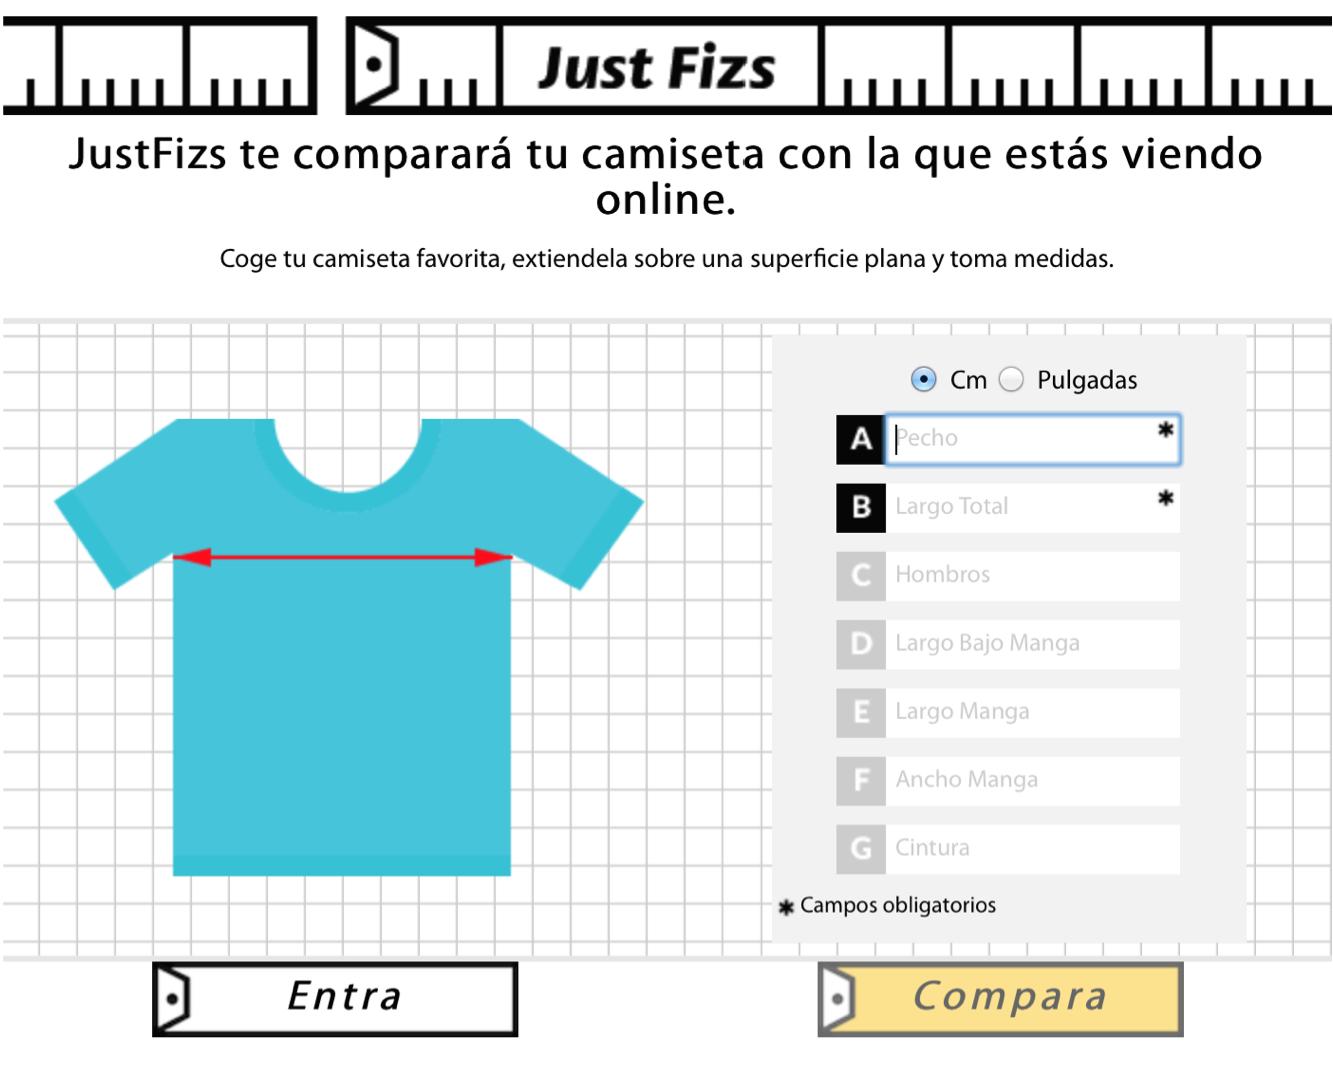 www.justfizs.com